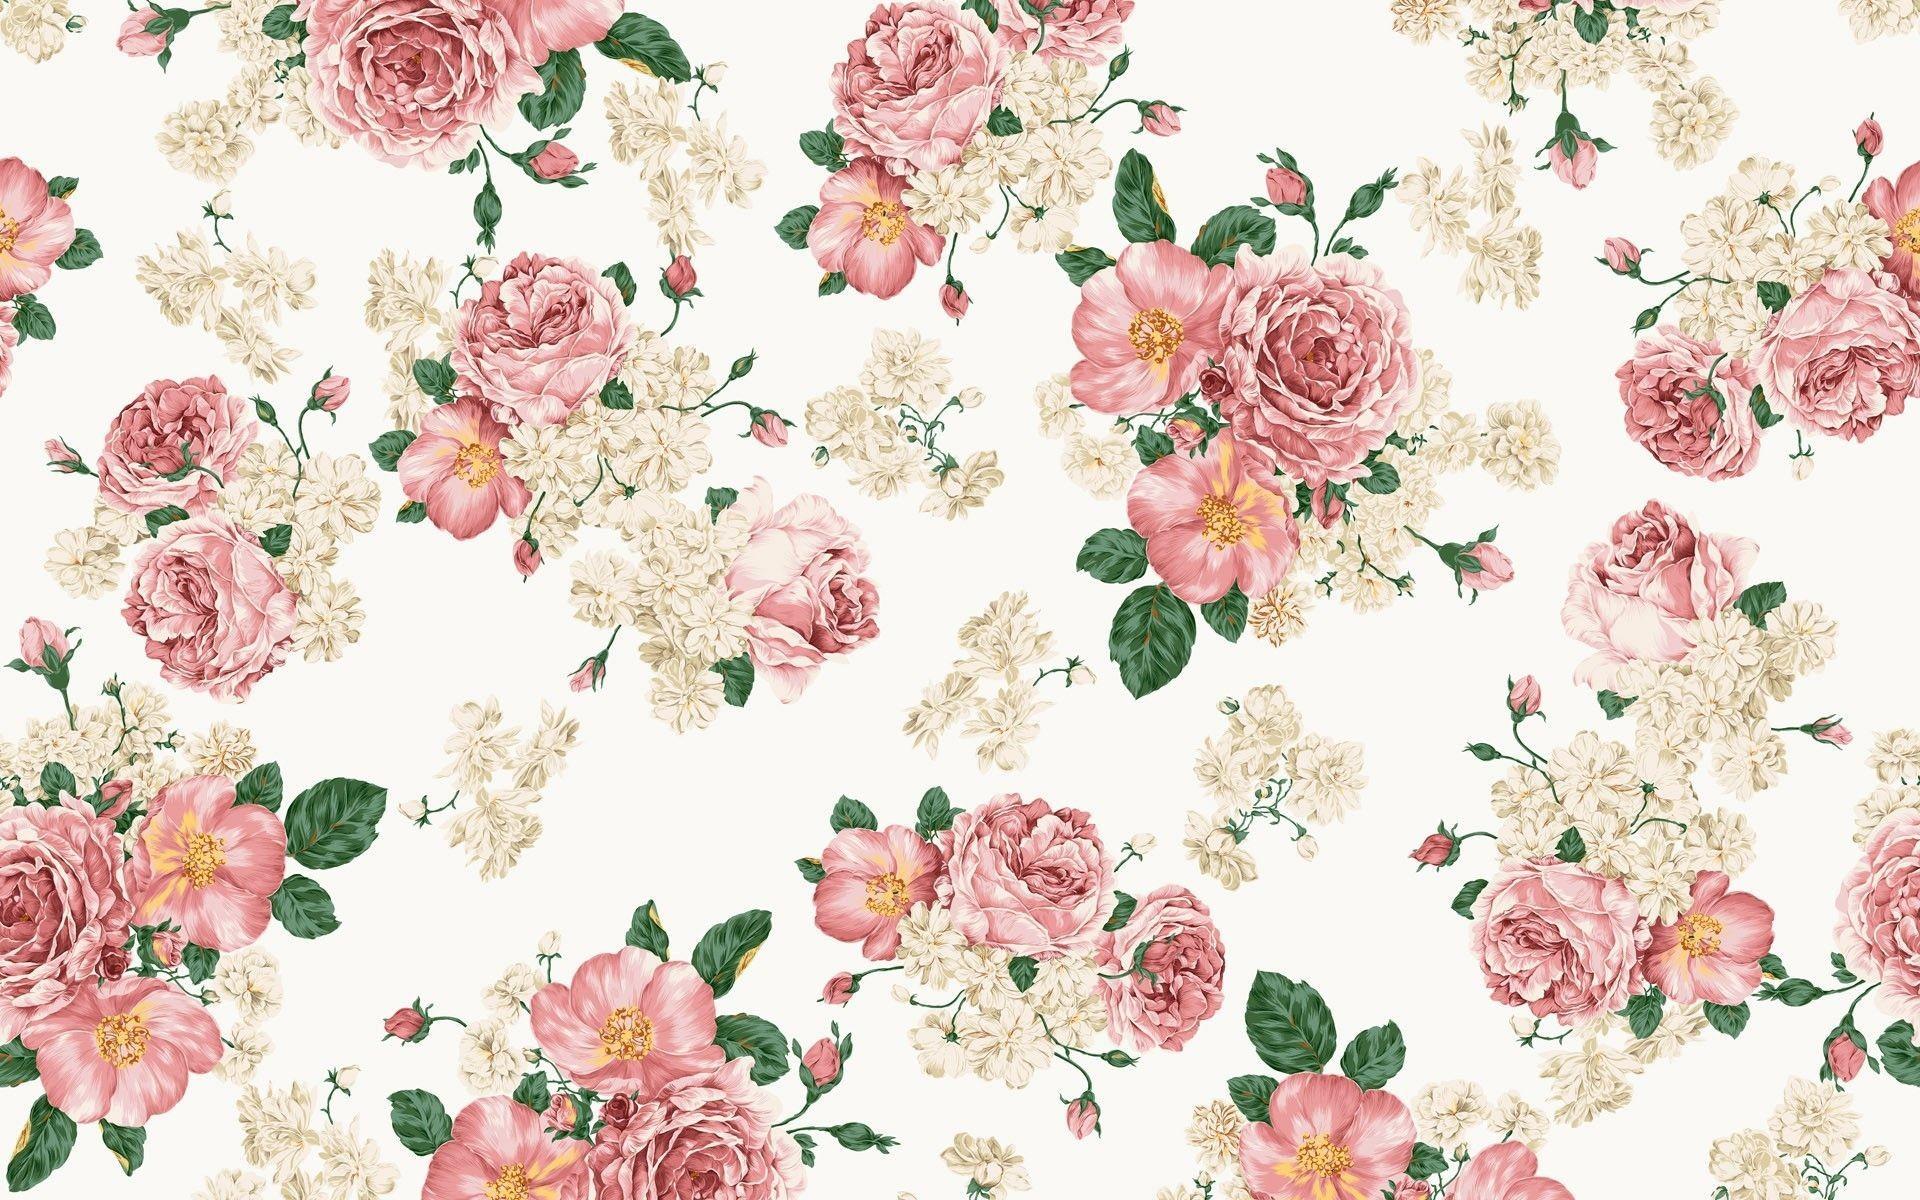 Watercolor Floral Desktop Wallpaper